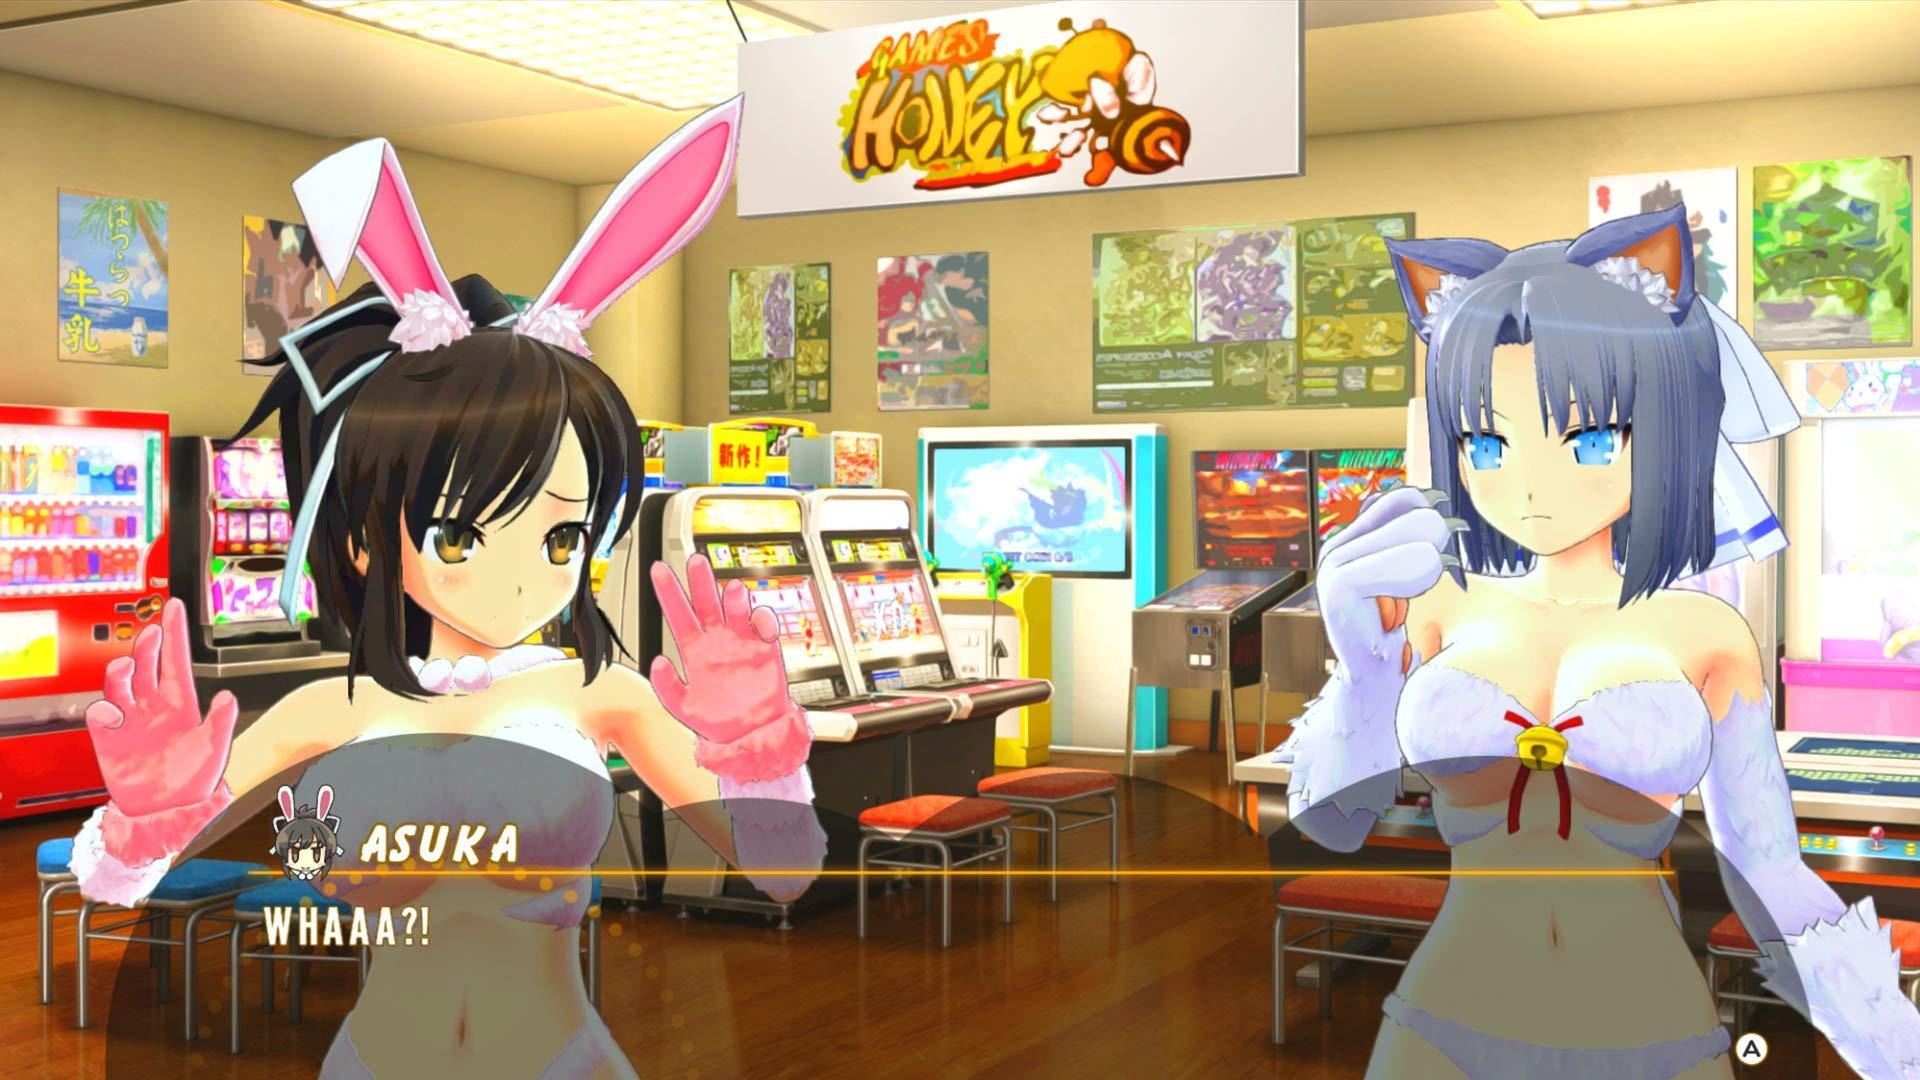 Senran Kagura Peach Ball - Nintendo Switch by Xseed (Image #5)